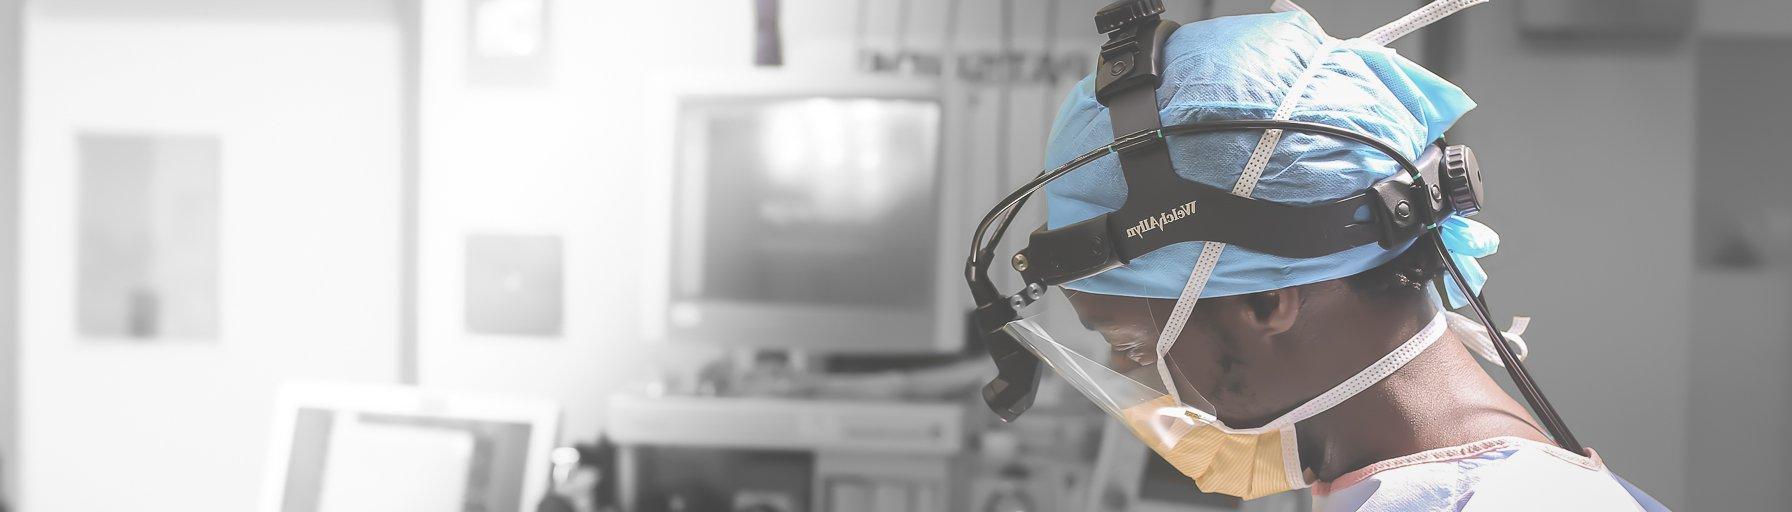 Diabetes Surgery Perth Bariatric Surgery Dr Andrew Kiyingi